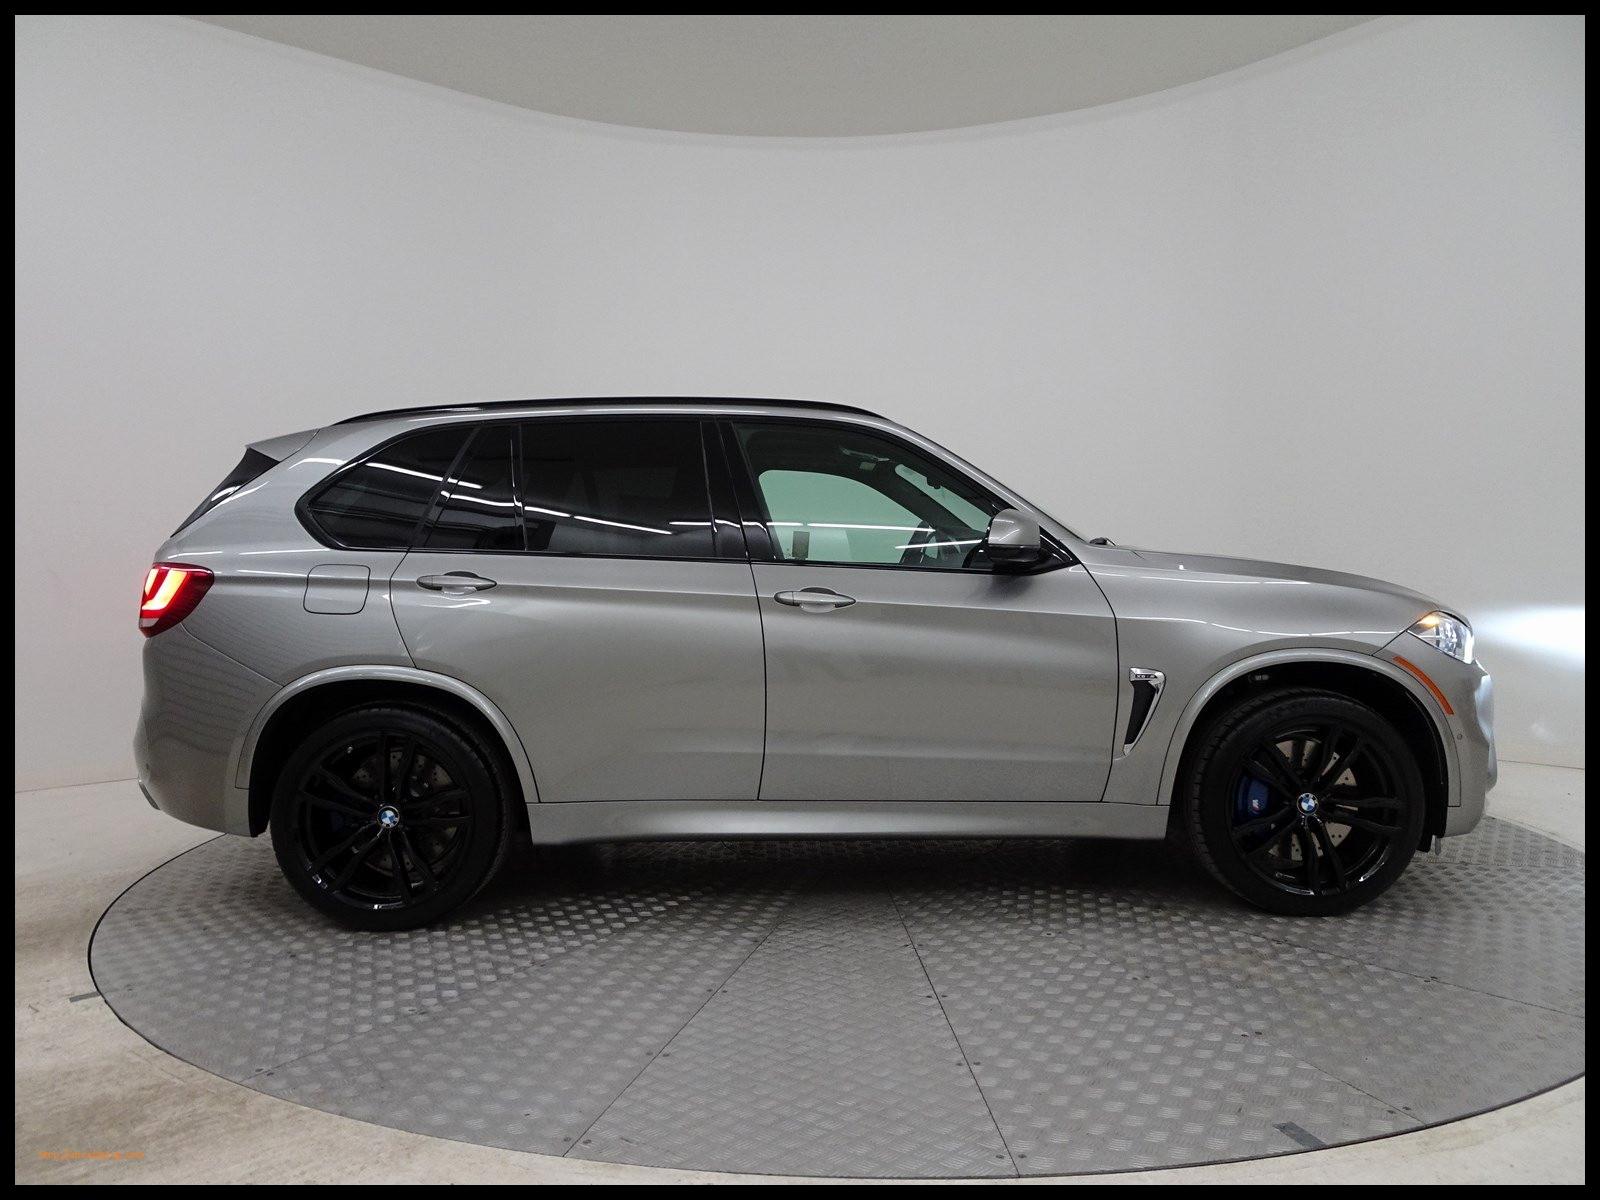 Bmw X5 Carmax Elegant Carmax Bmw X5 Best Bmw X5 M for Sale ¢–·